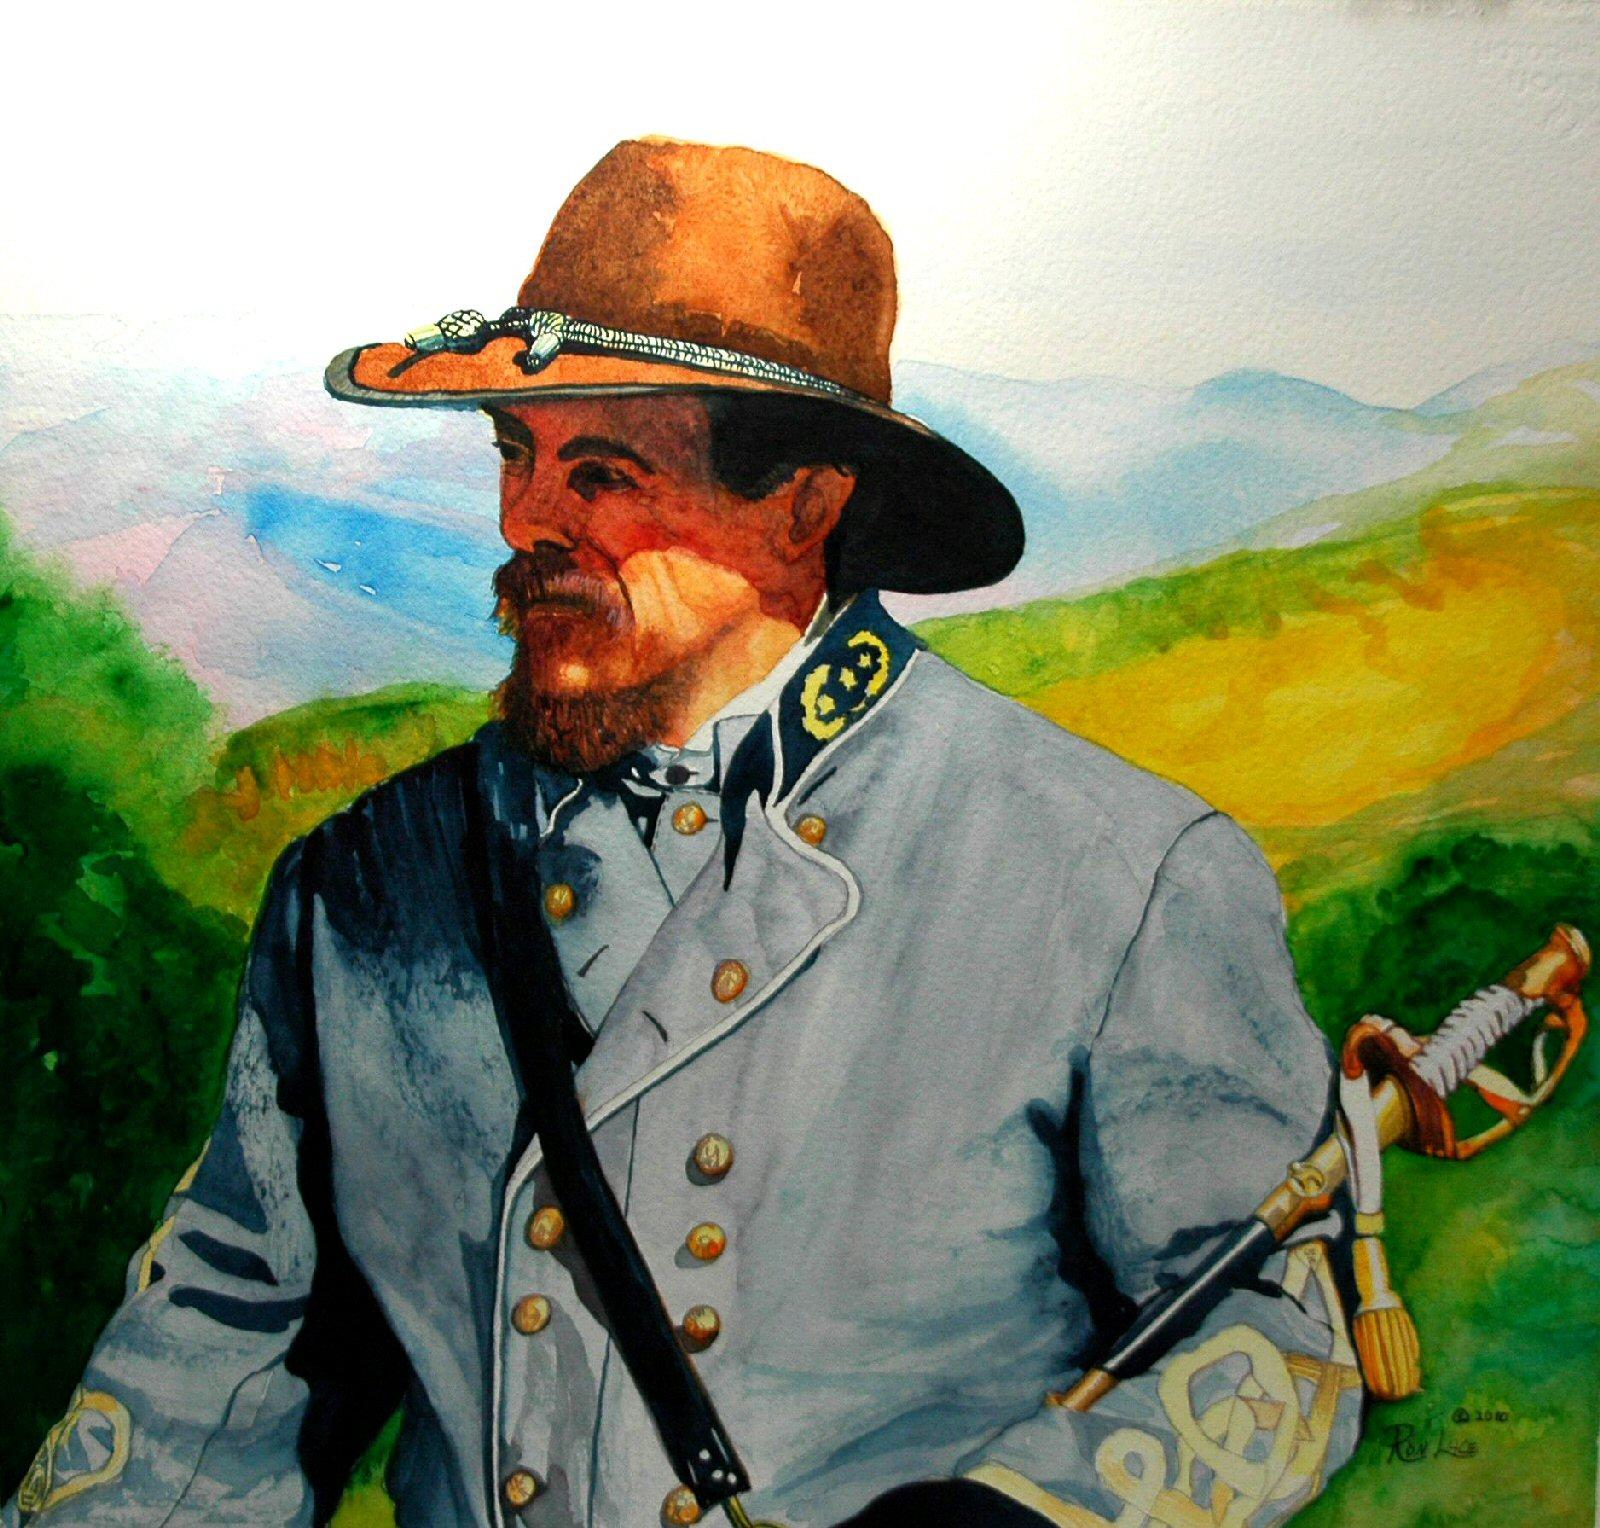 Look Awaw Dixie Land